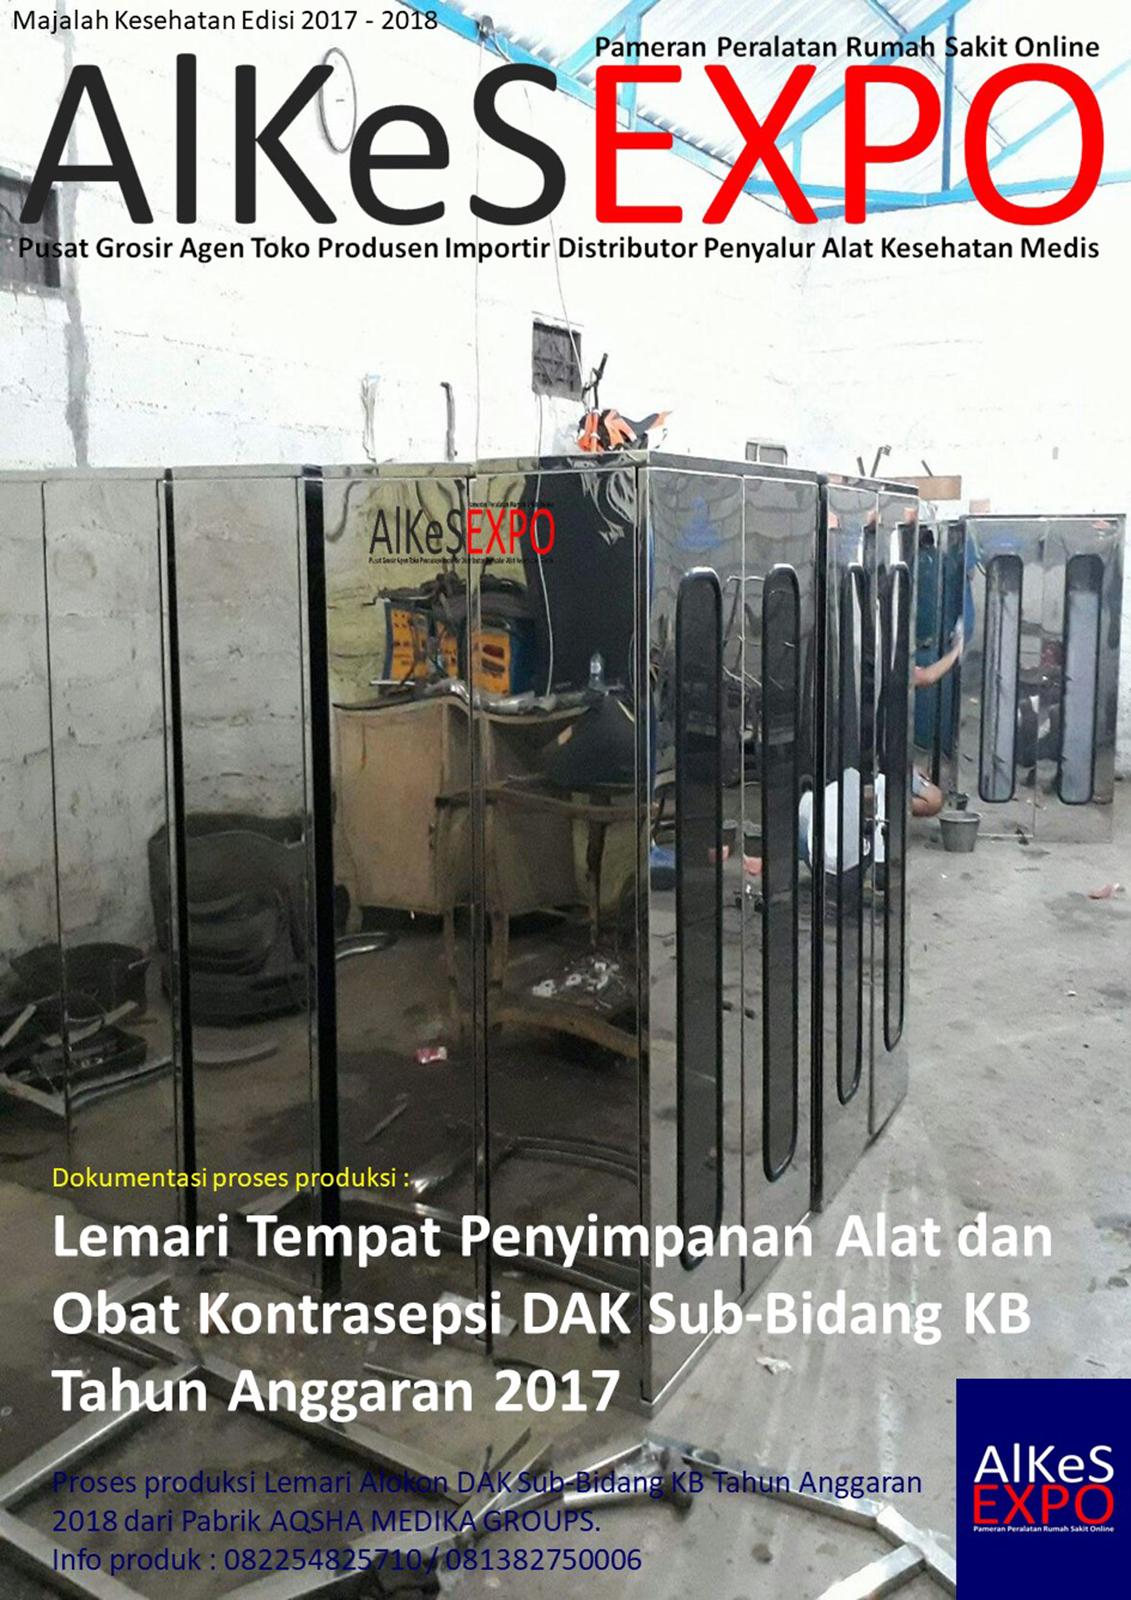 Proses Produksi Pesanan Lemari Alokon DAK BKKBN 2018